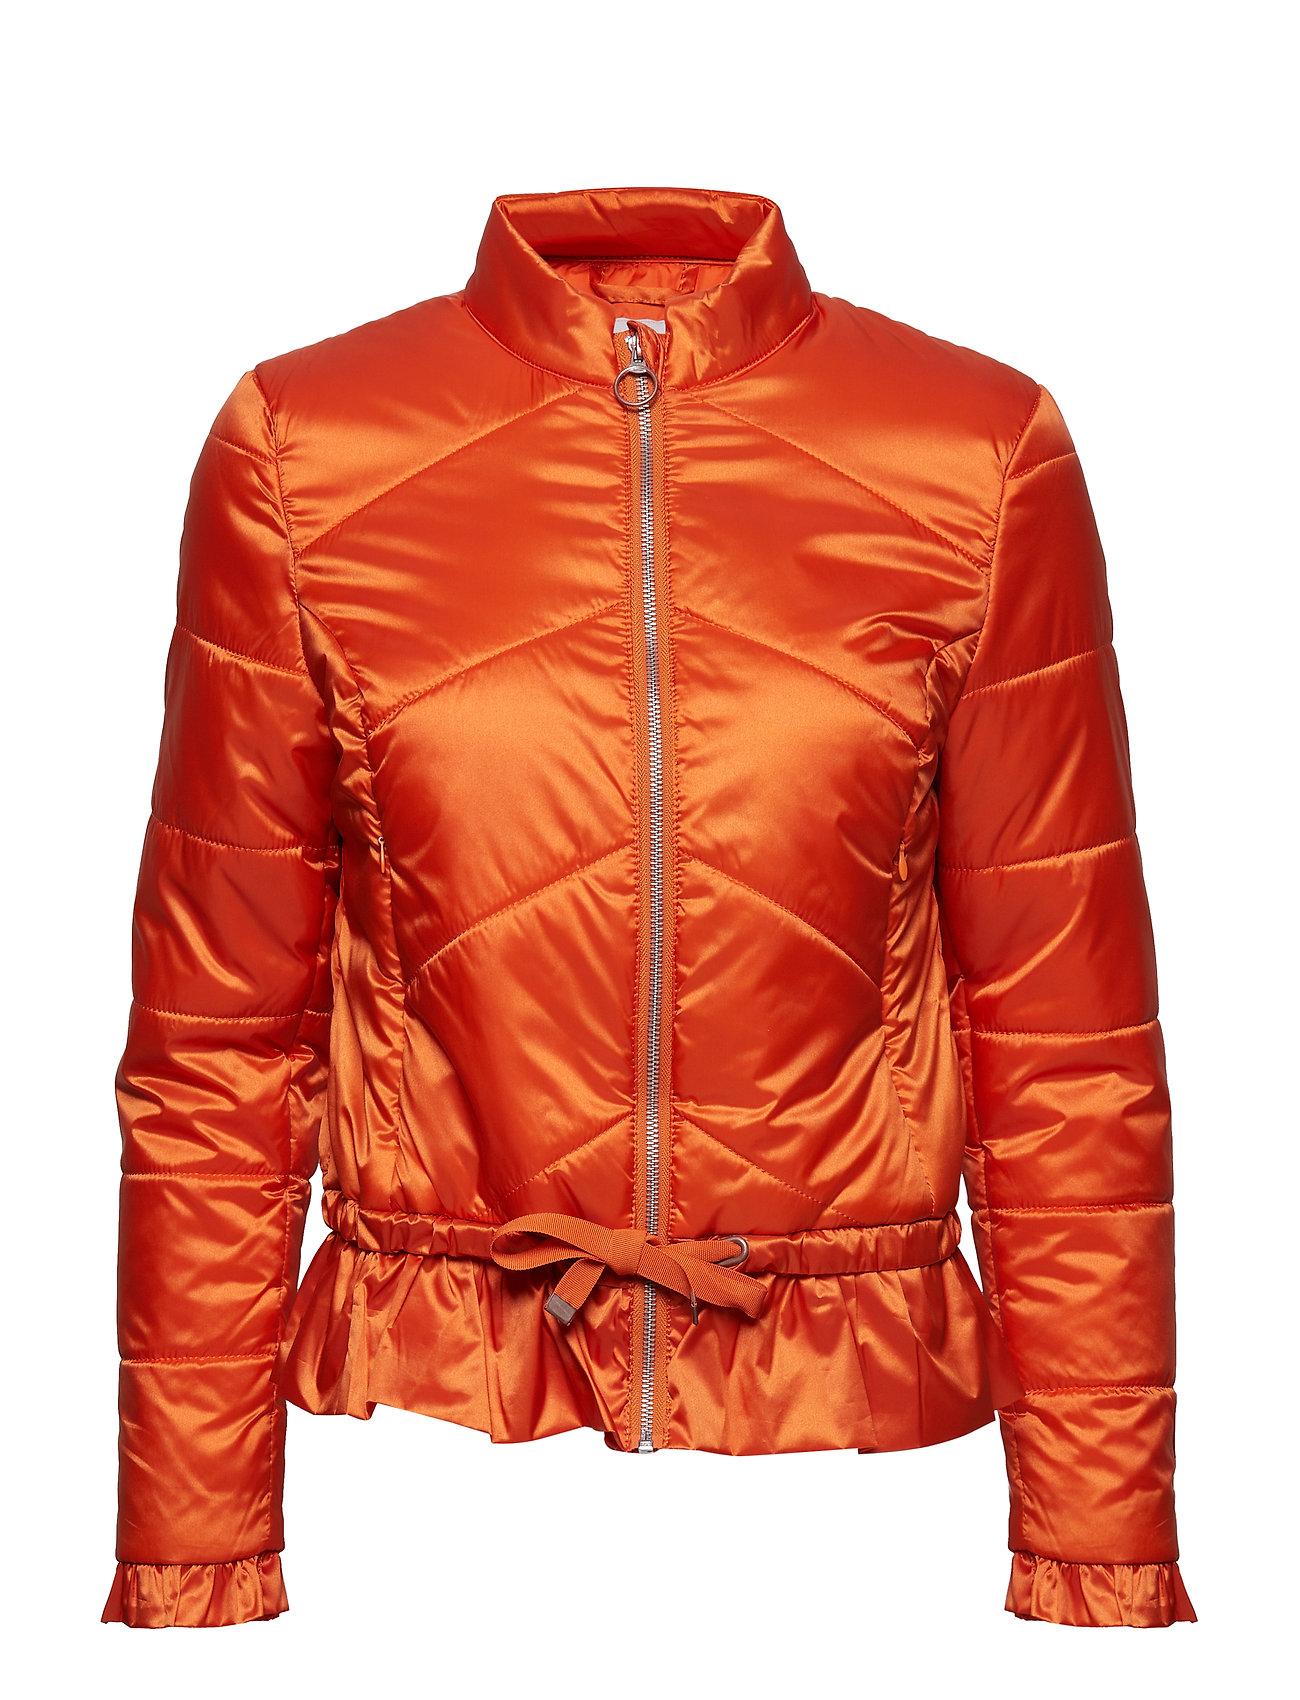 Cream Crystal spring jacket - PUMPKIN ORANGE